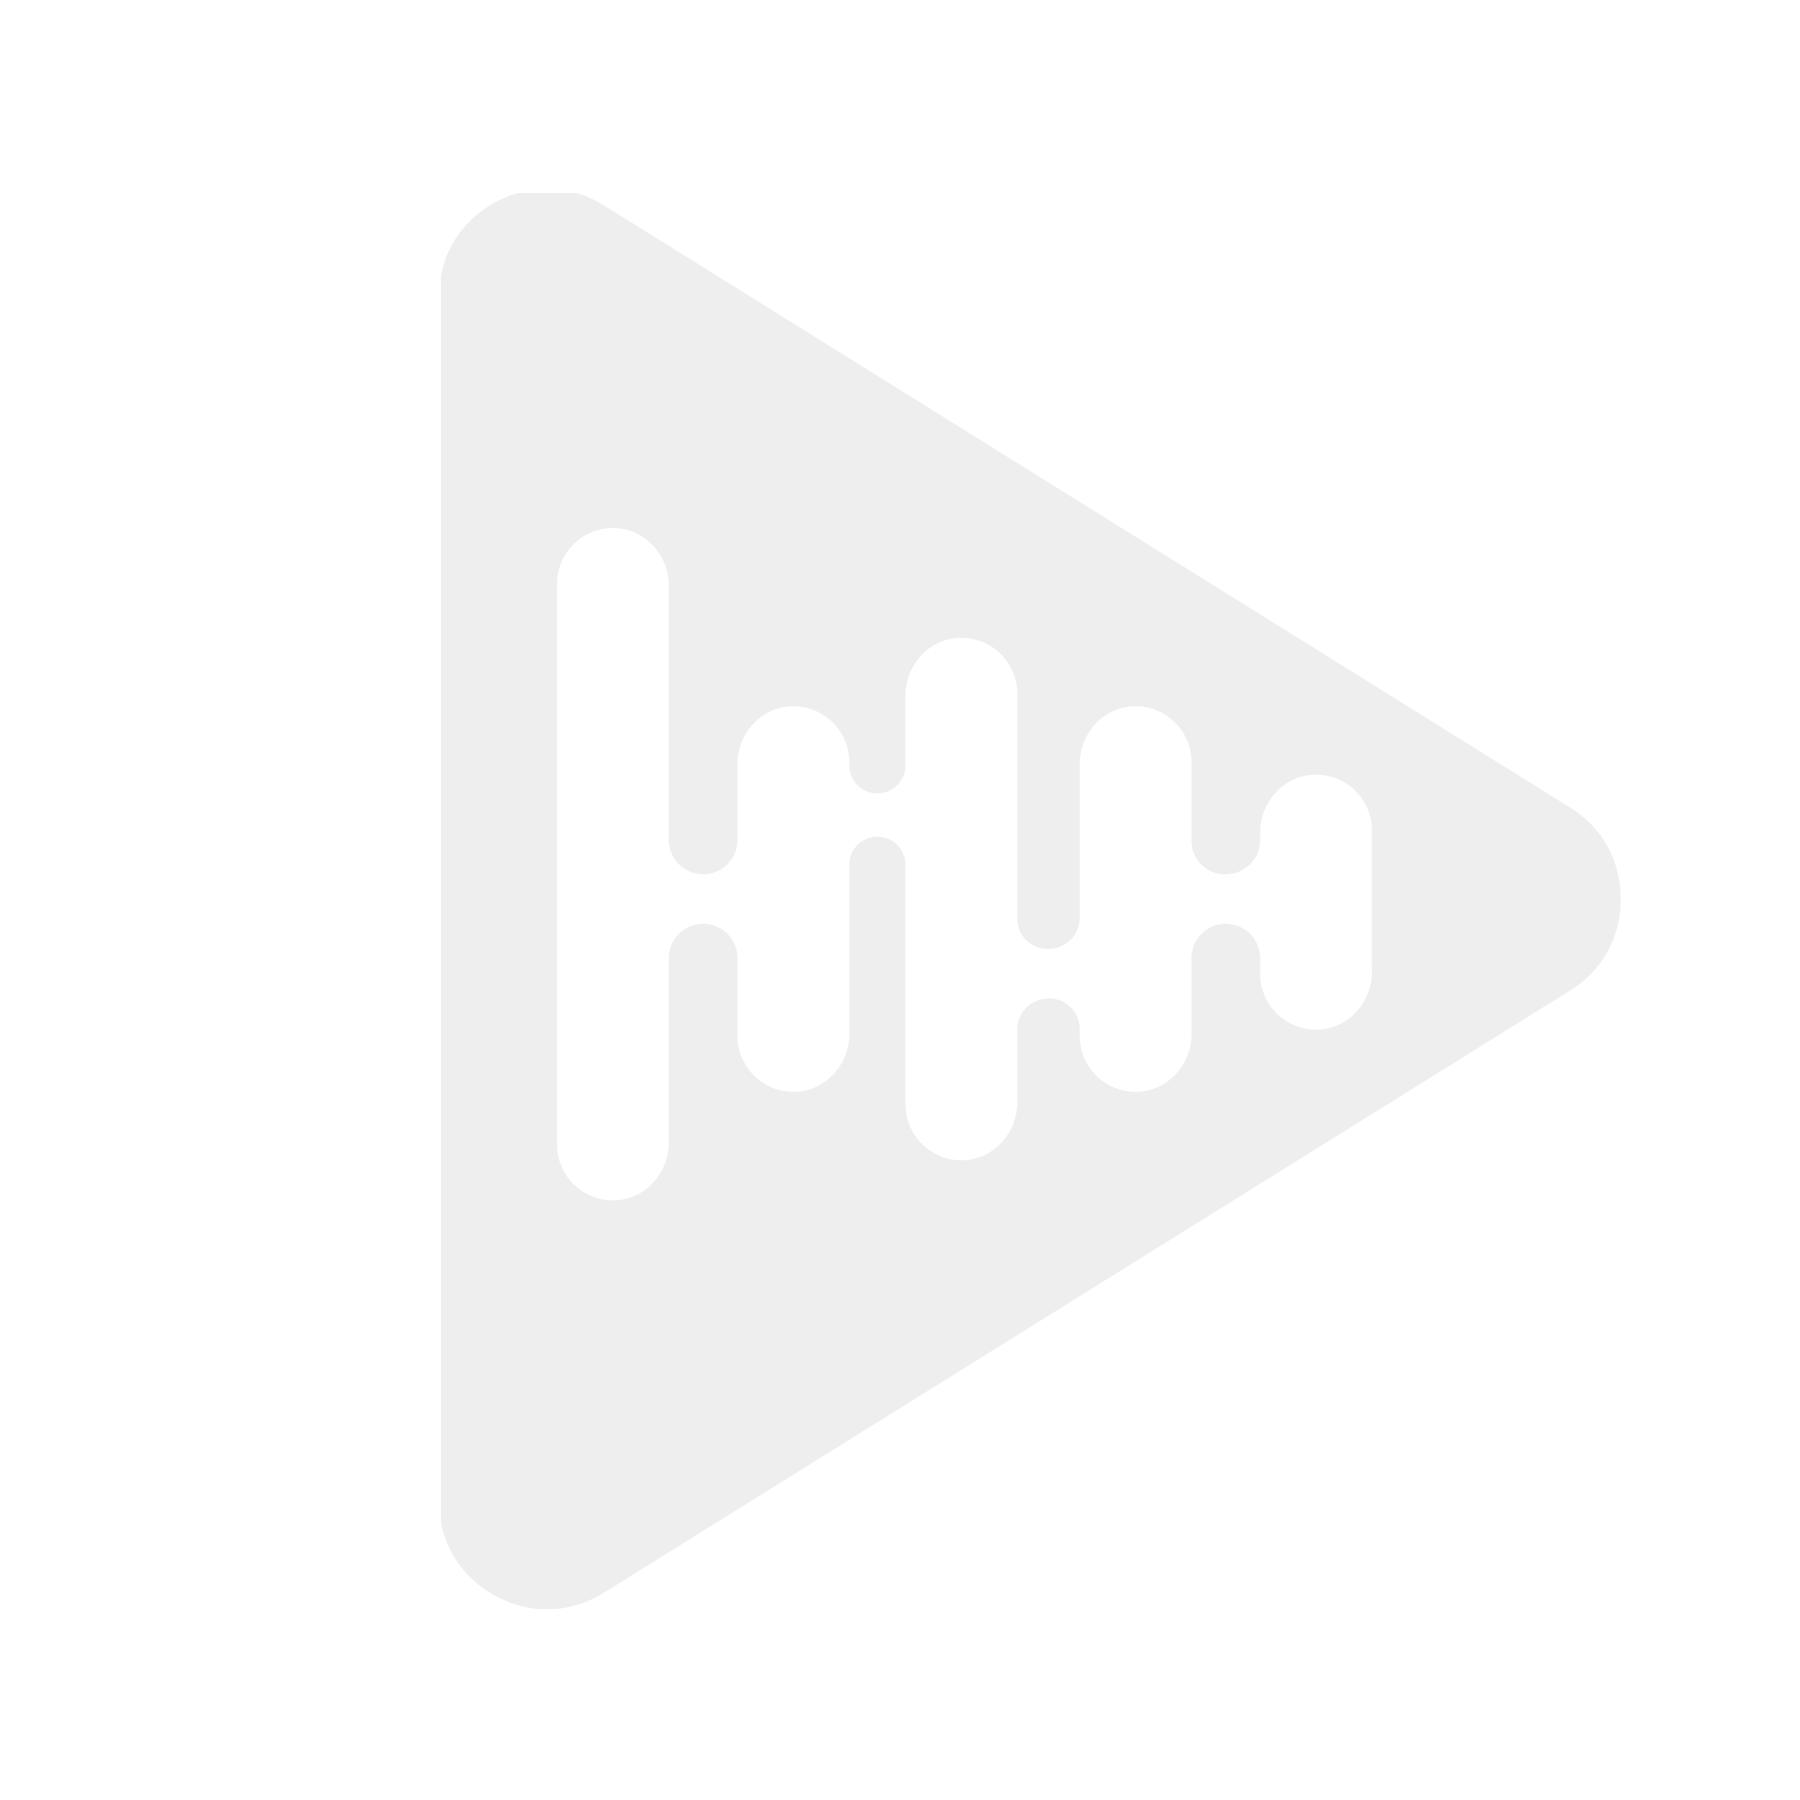 Audison APBMW-F87-HIFI